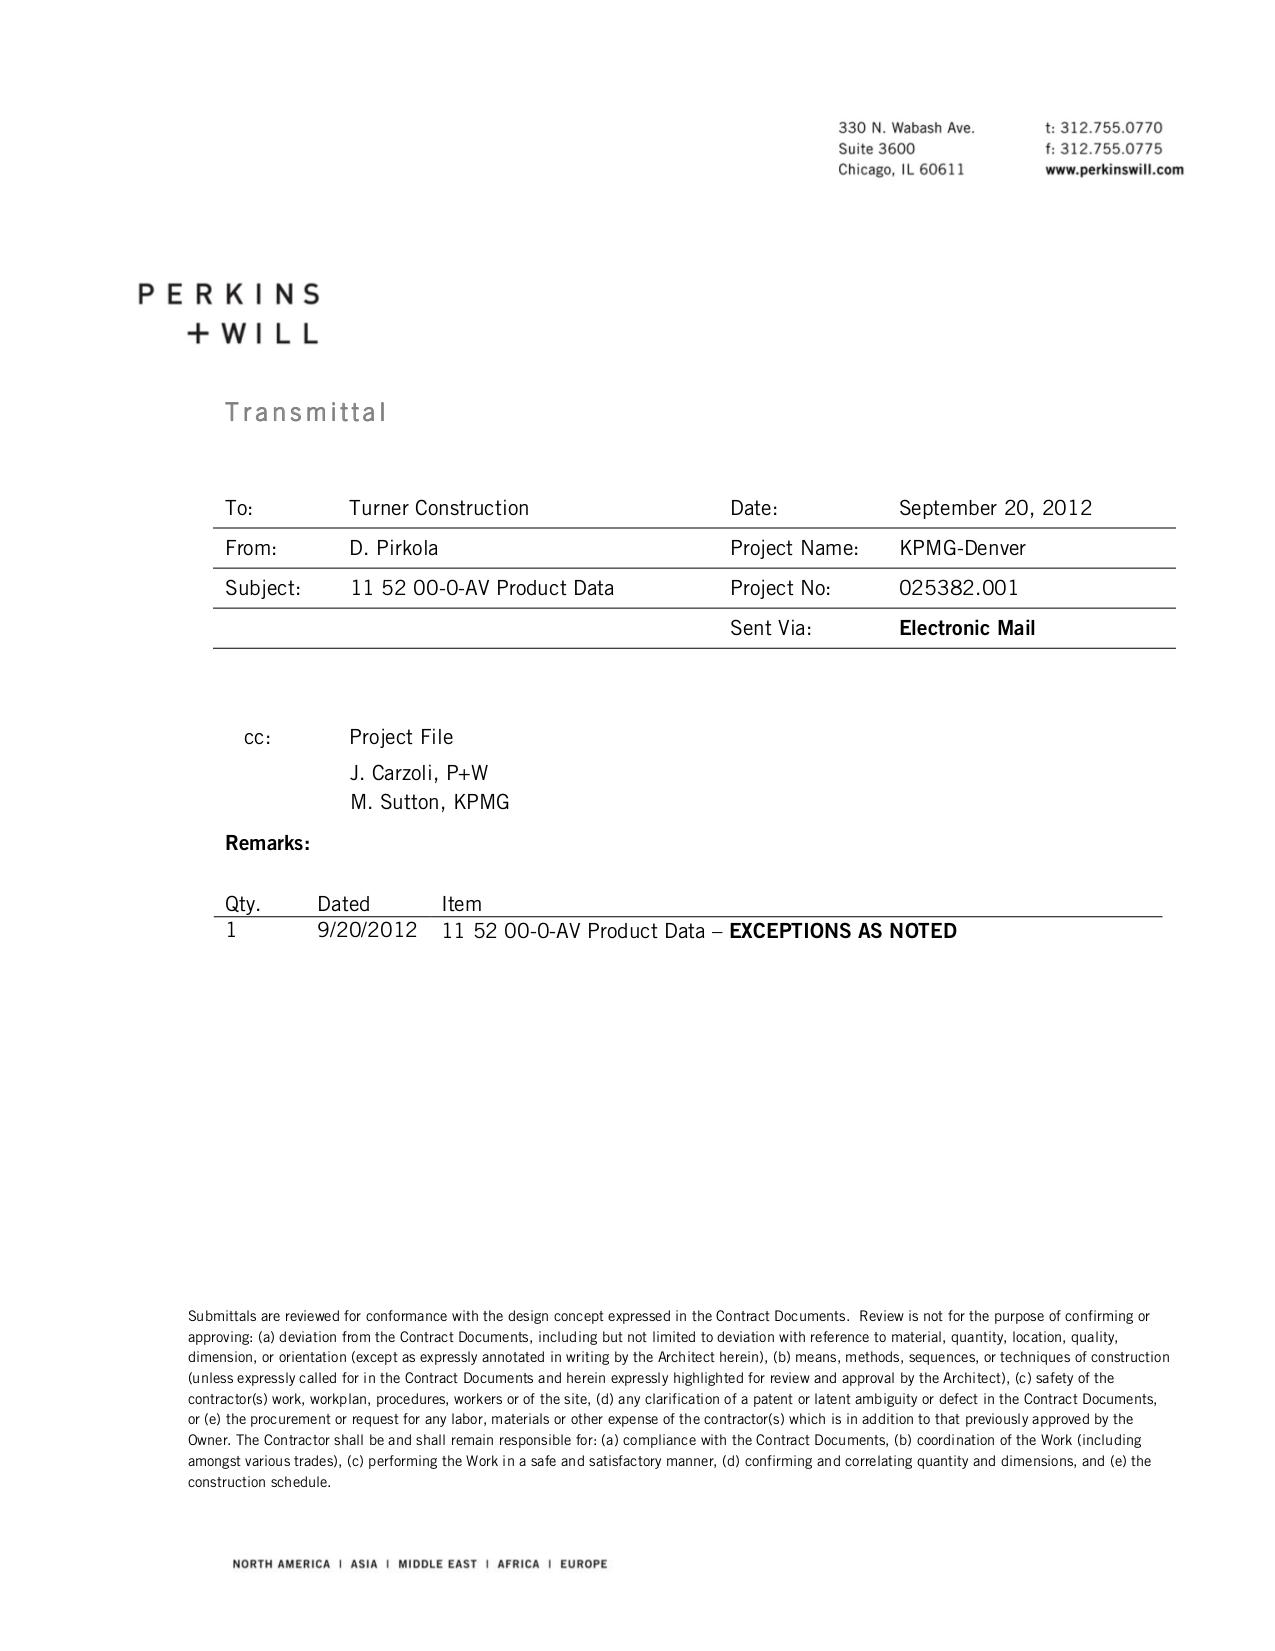 pdf for Xantech Other IR-DC4 Interface Modules manual